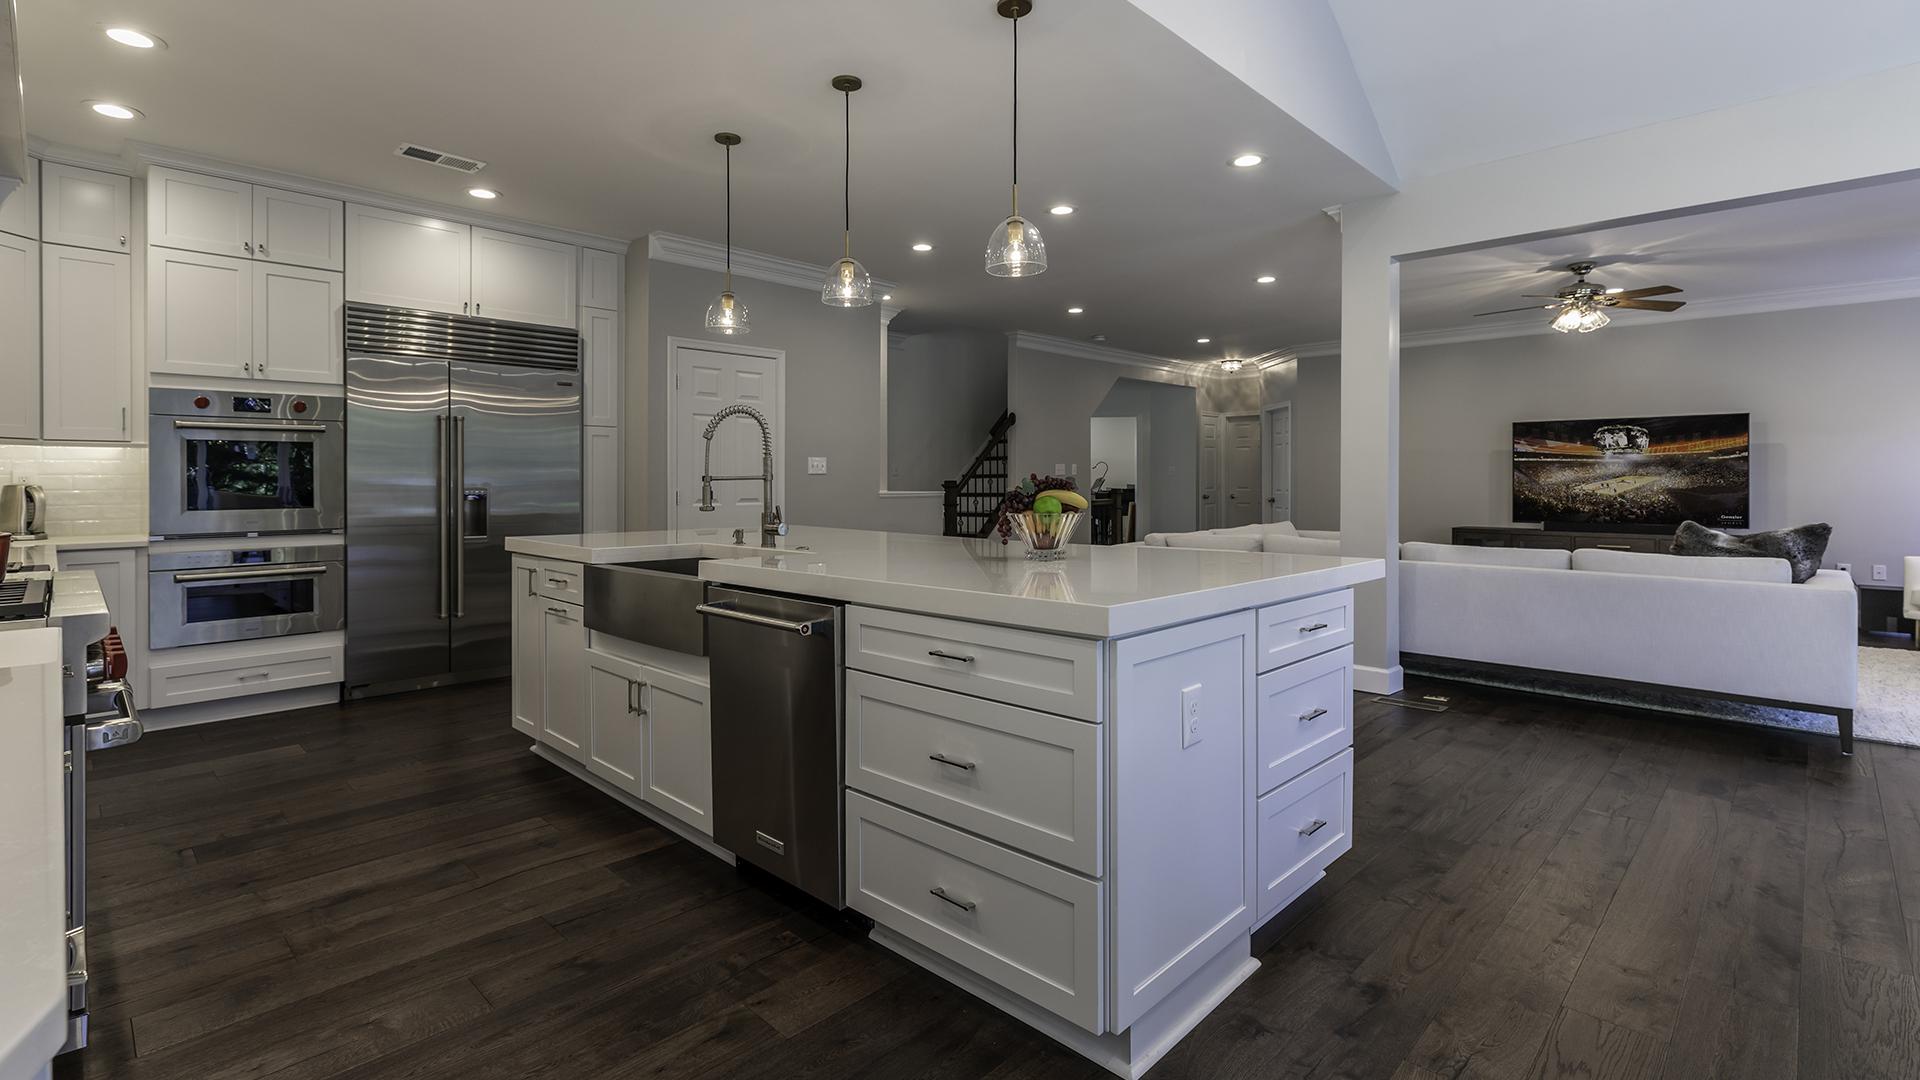 2021 NARI Metro DC Coty MERIT AWARD Entire House Under $250,000